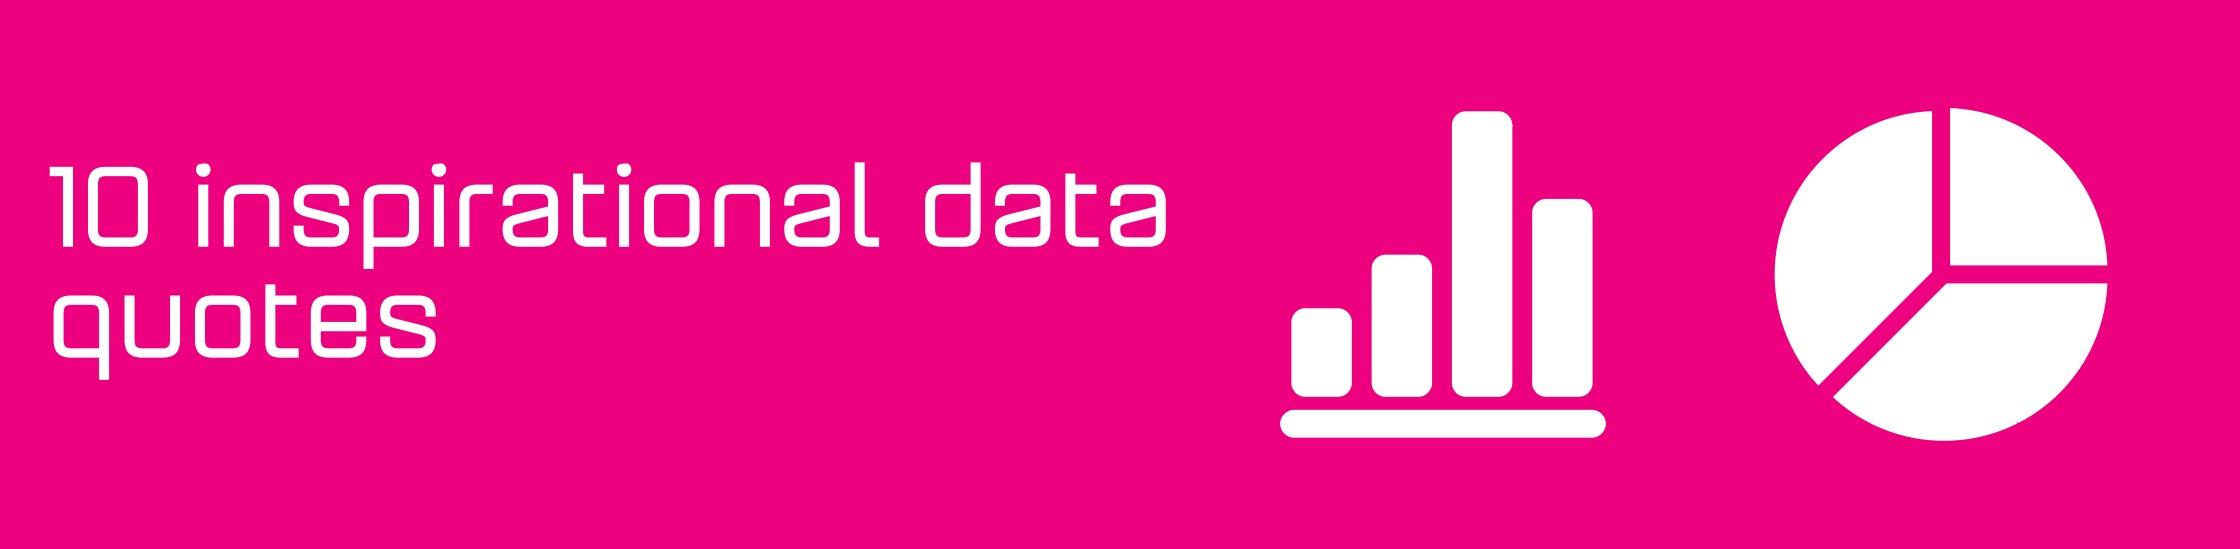 10 Inspirational Data Quotes